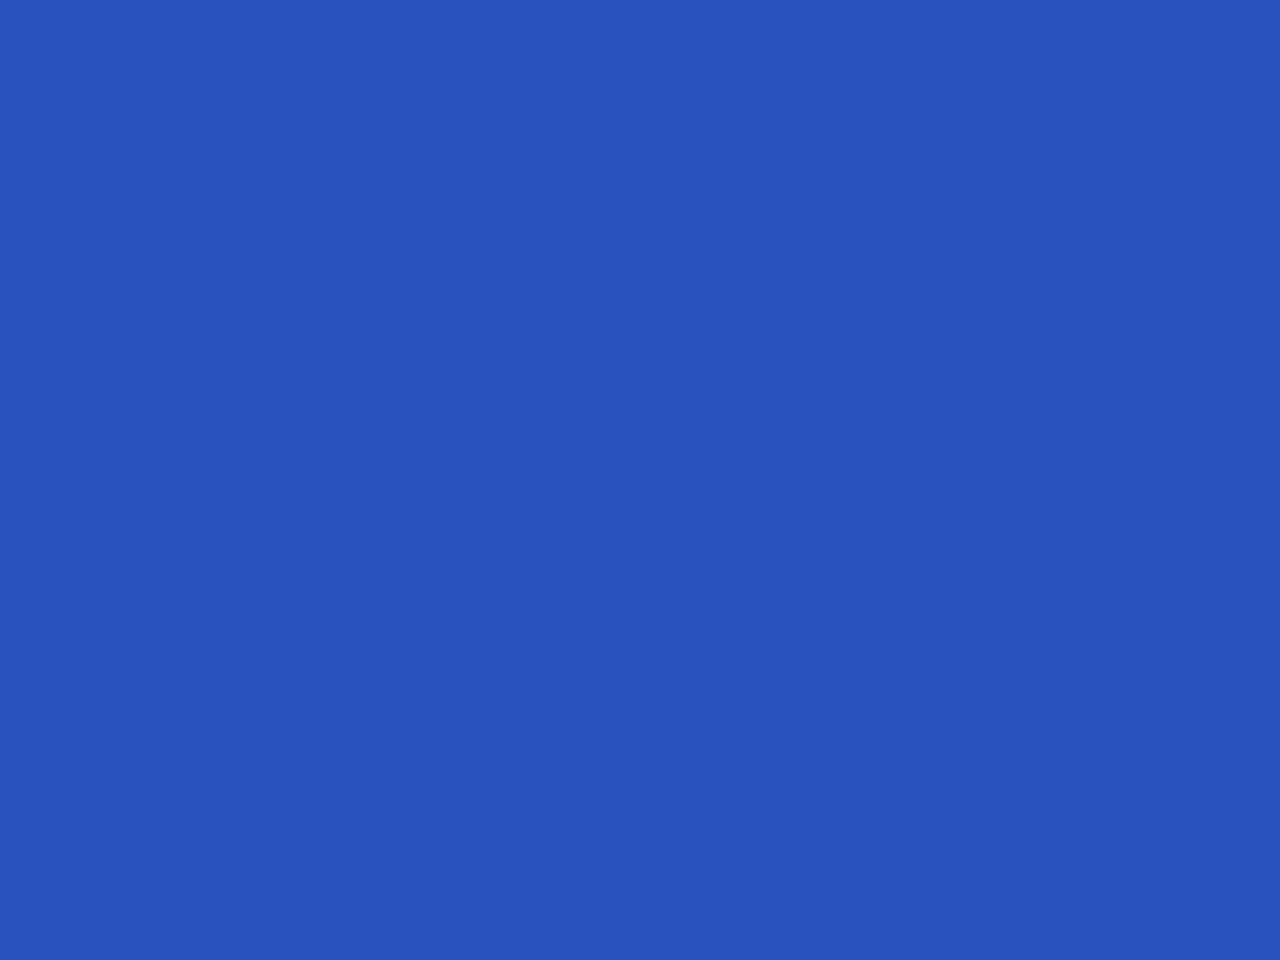 1280x960 Cerulean Blue Solid Color Background